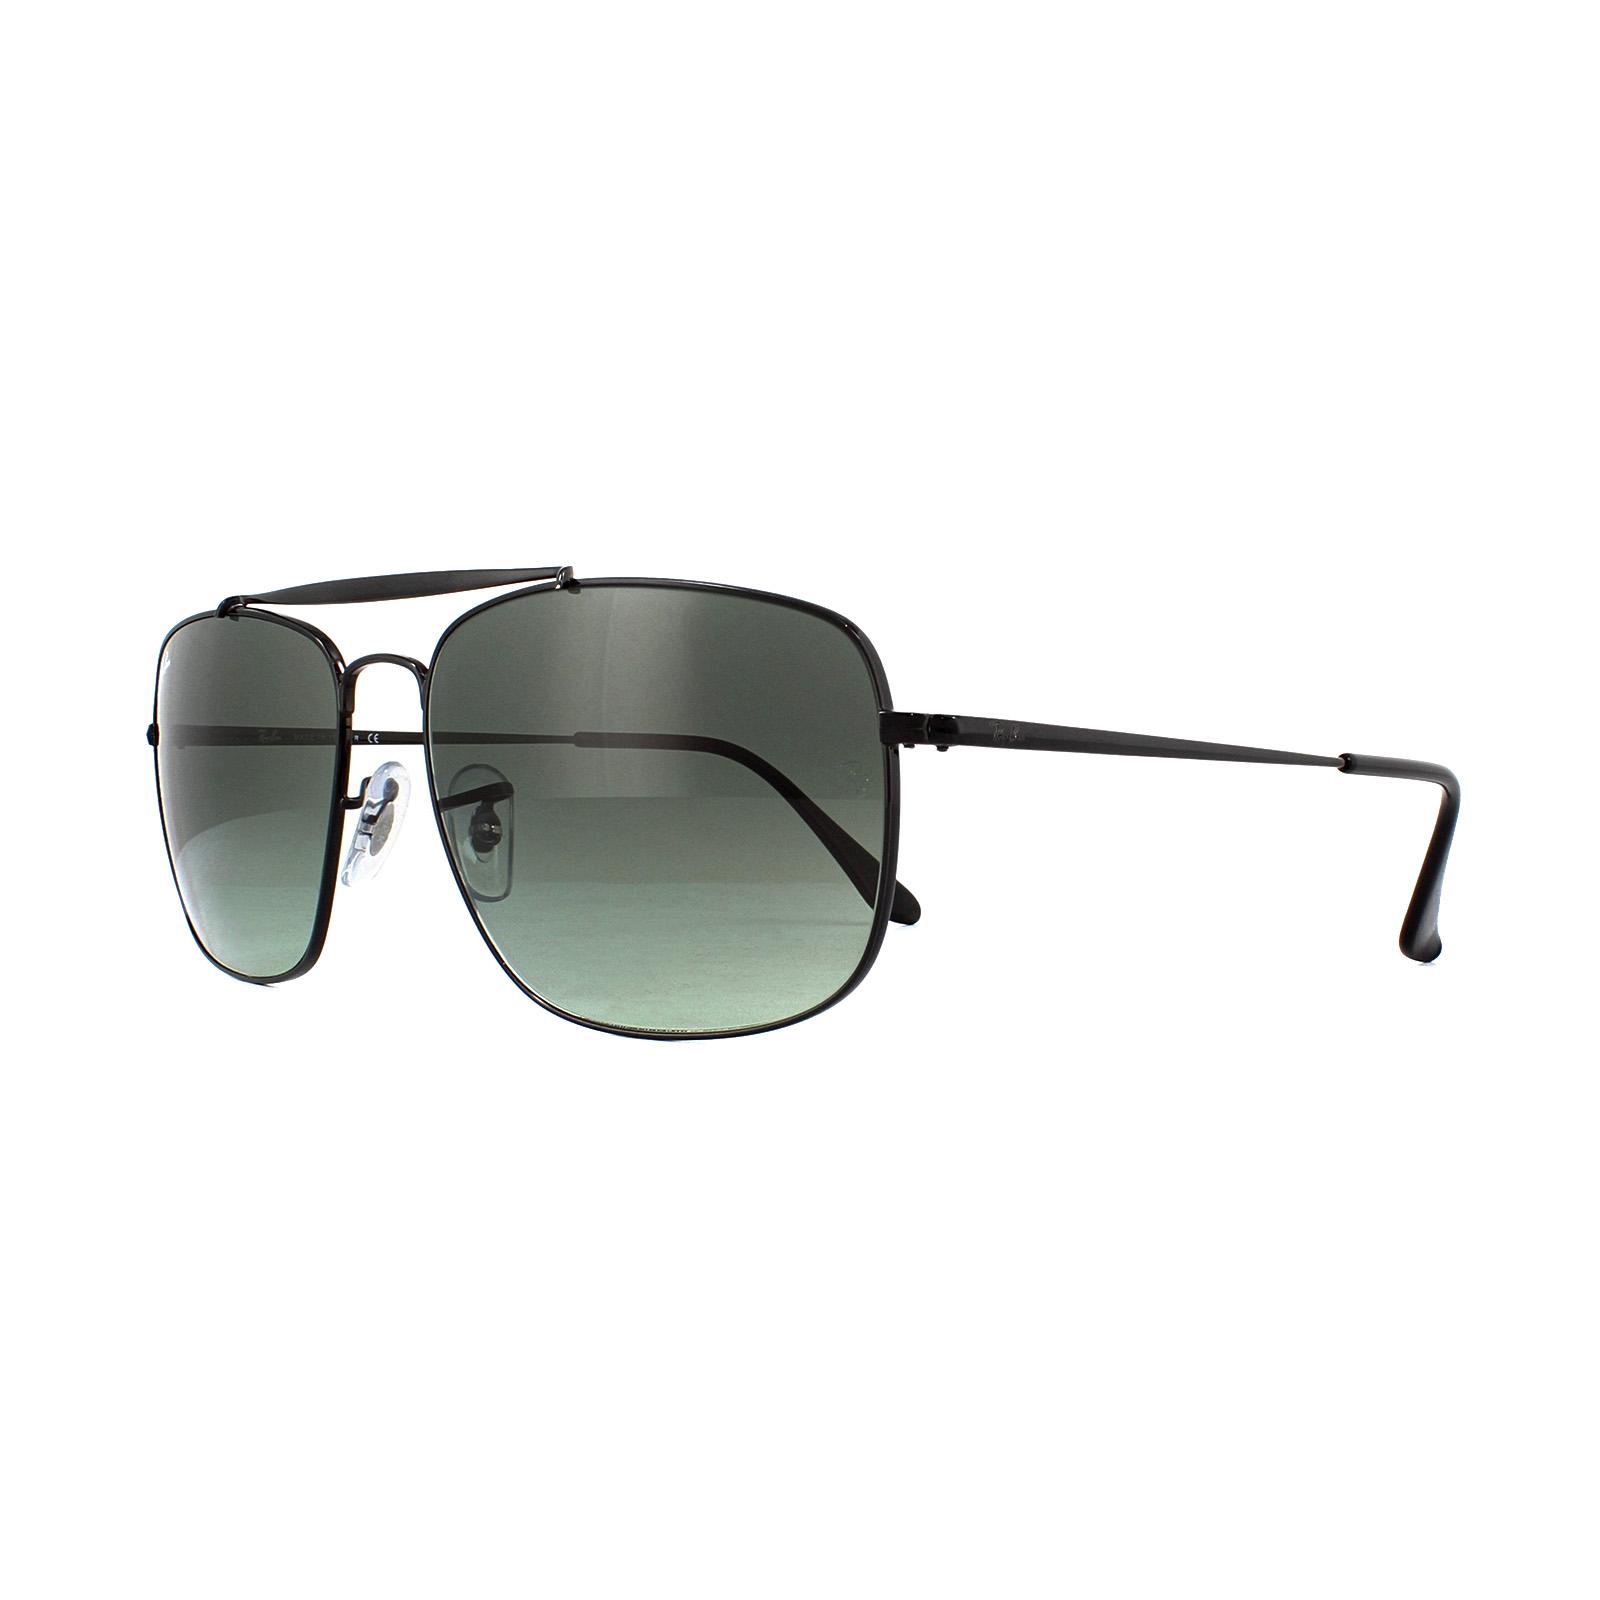 153cf8d2e3 Sentinel Ray-Ban Sunglasses The Colonel RB3560 002 71 Black Grey Gradient